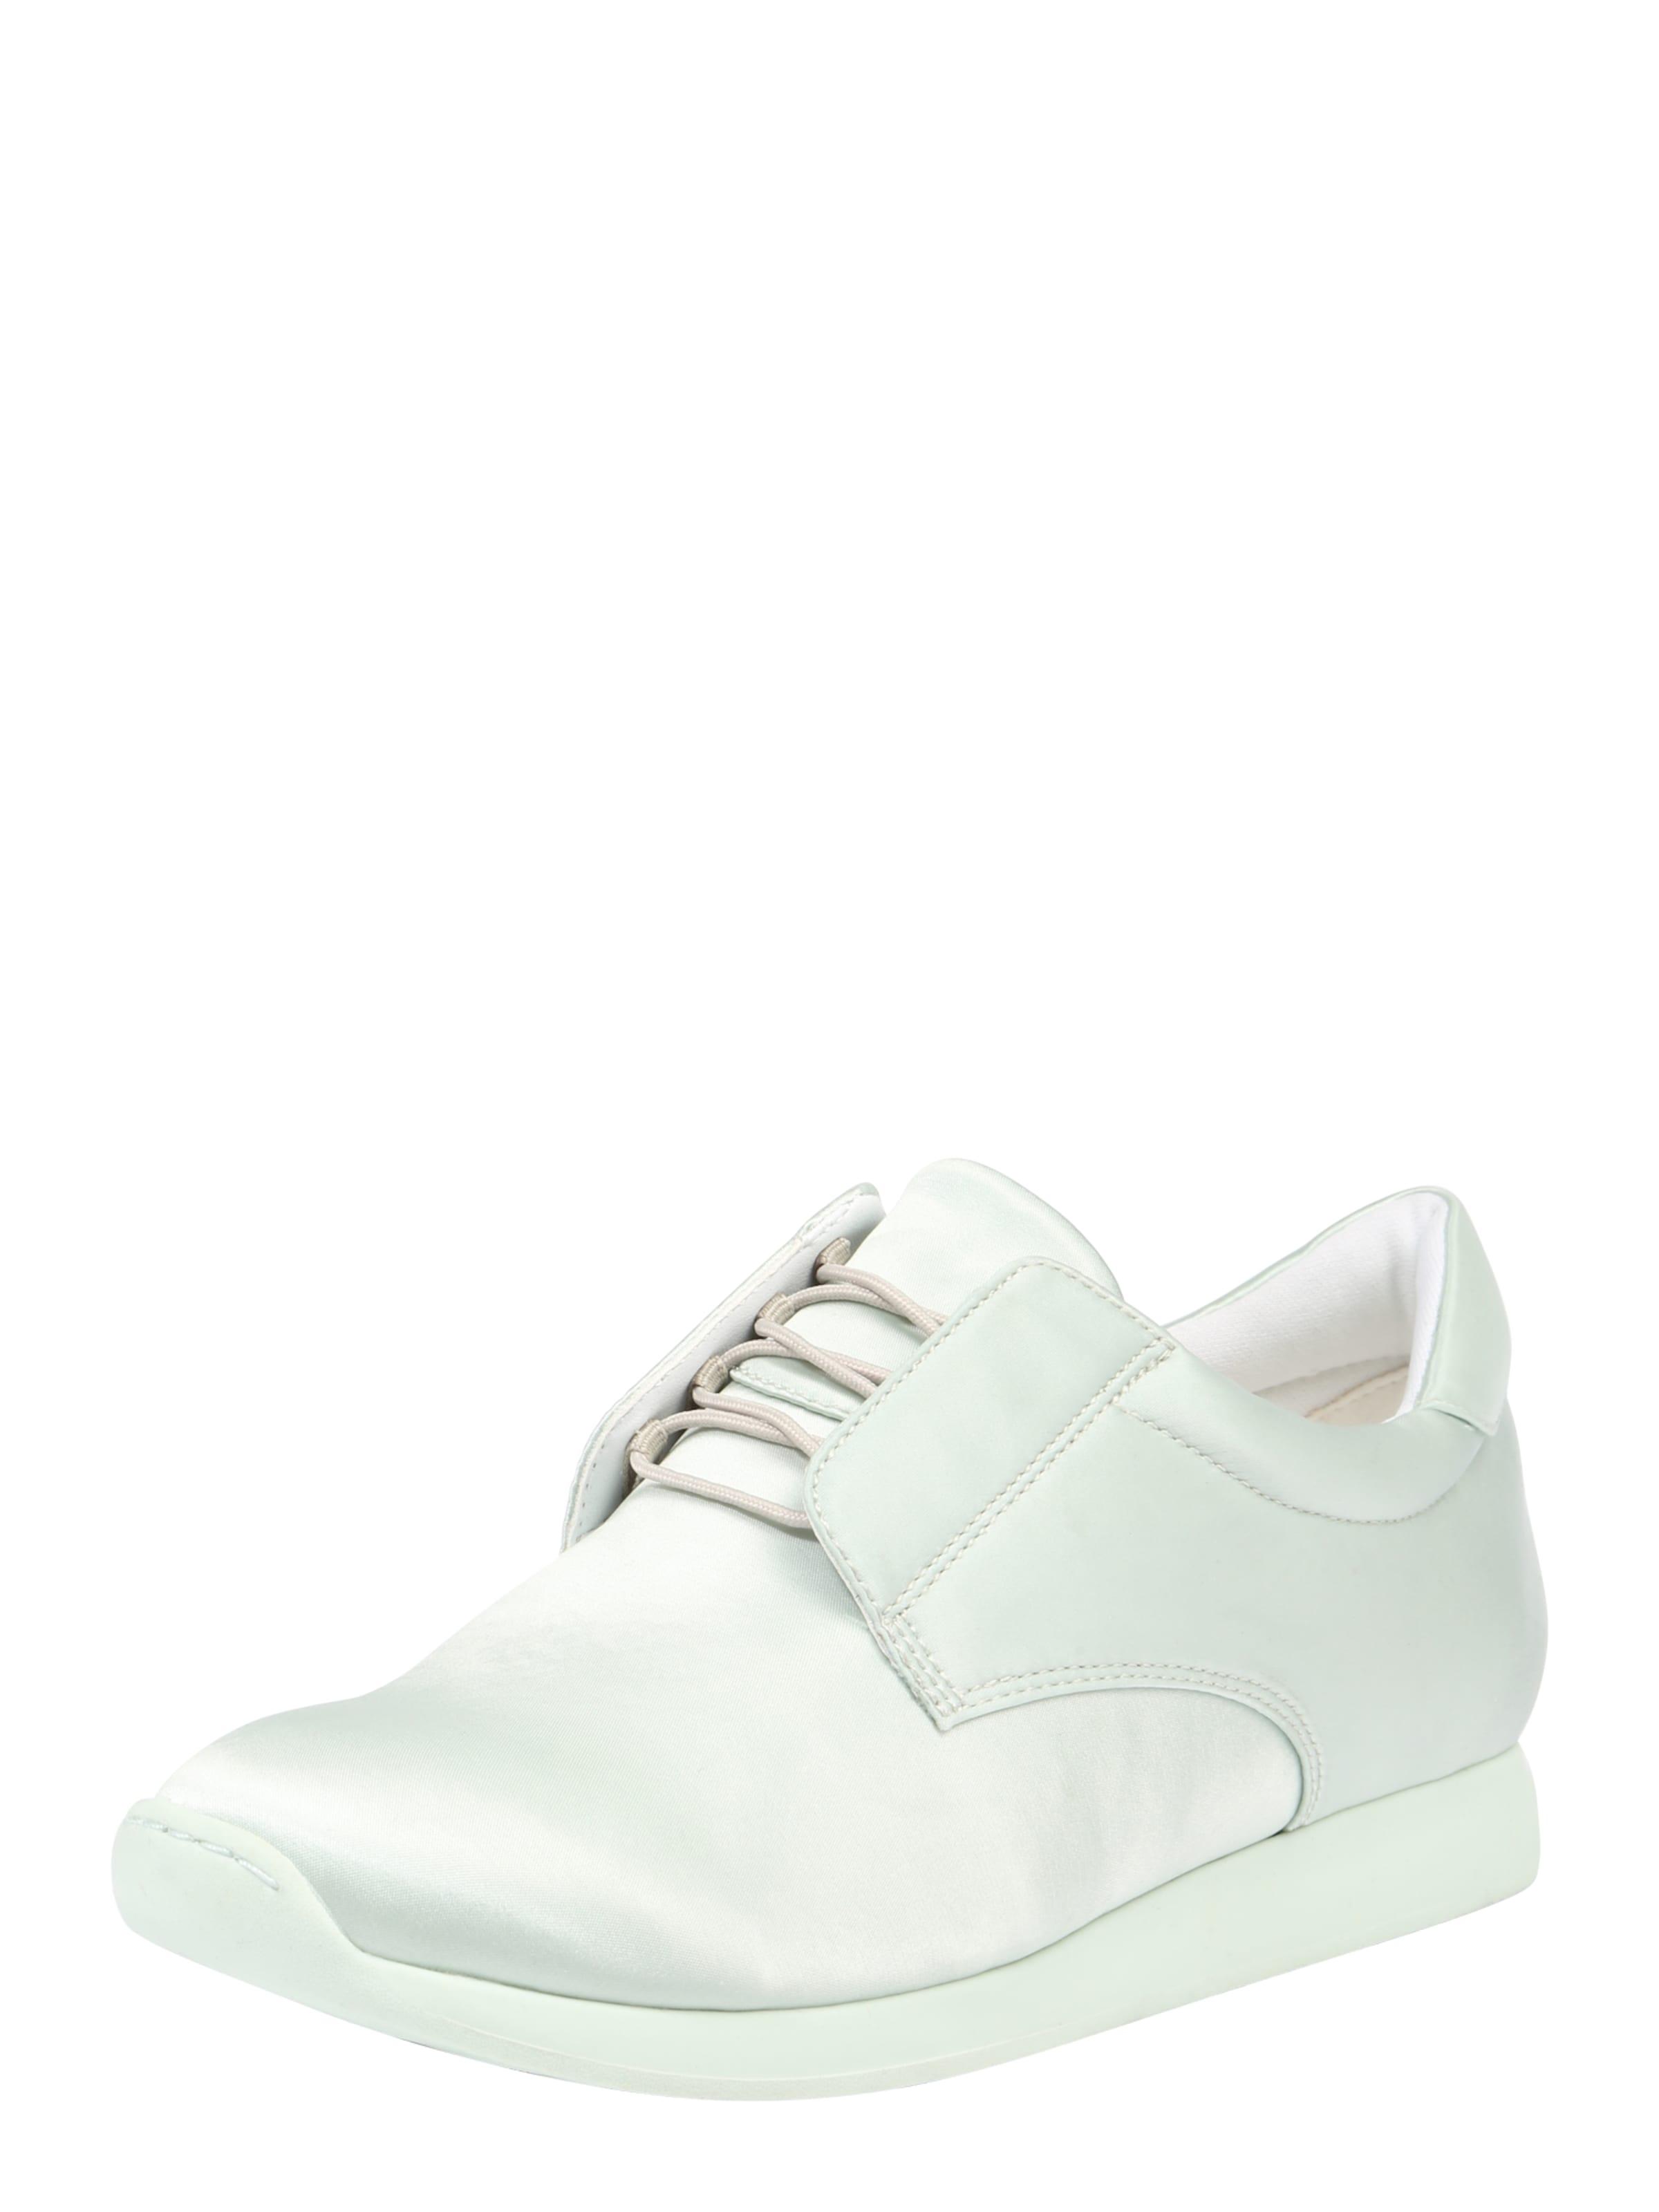 Vagabond Shoemakers Sneaker 'Kasai' Mint wiFhPXJAh